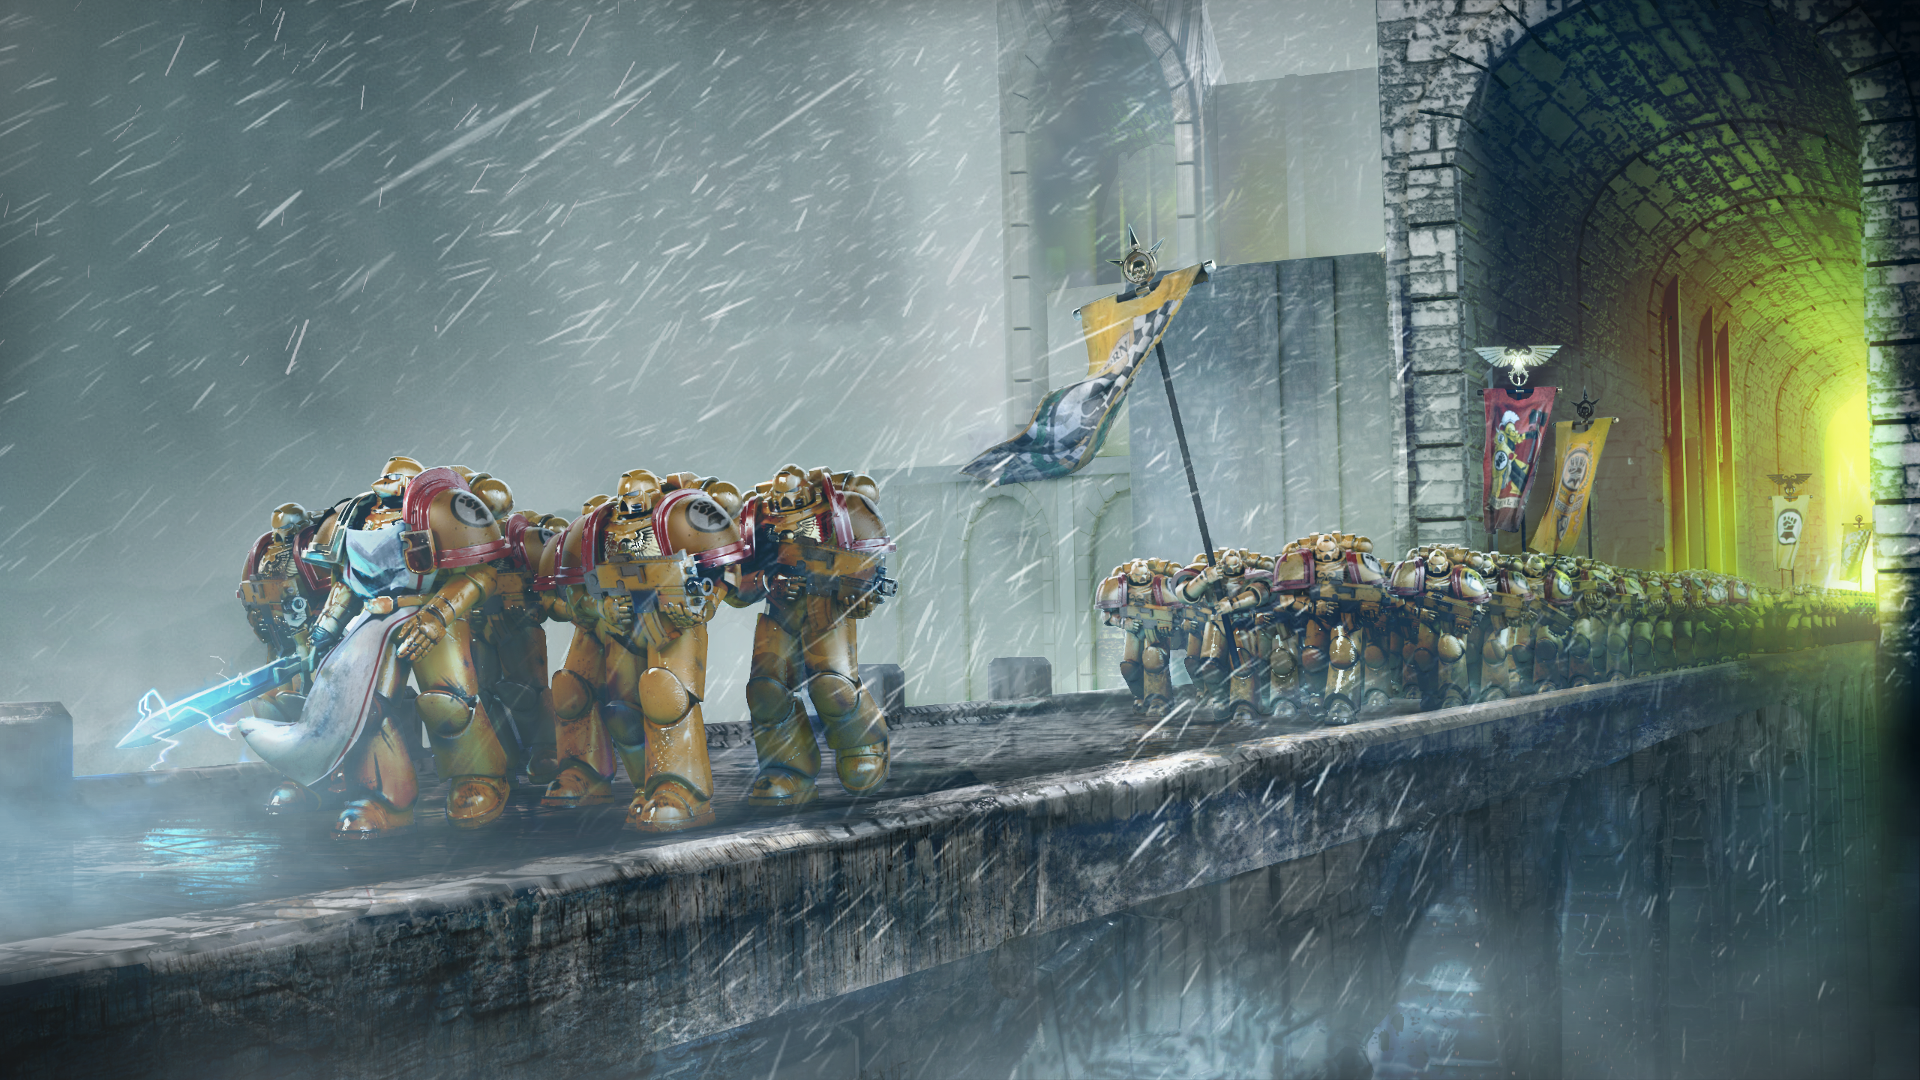 Warhammer 40k Hd Wallpaper Background Image 1920x1080 Id